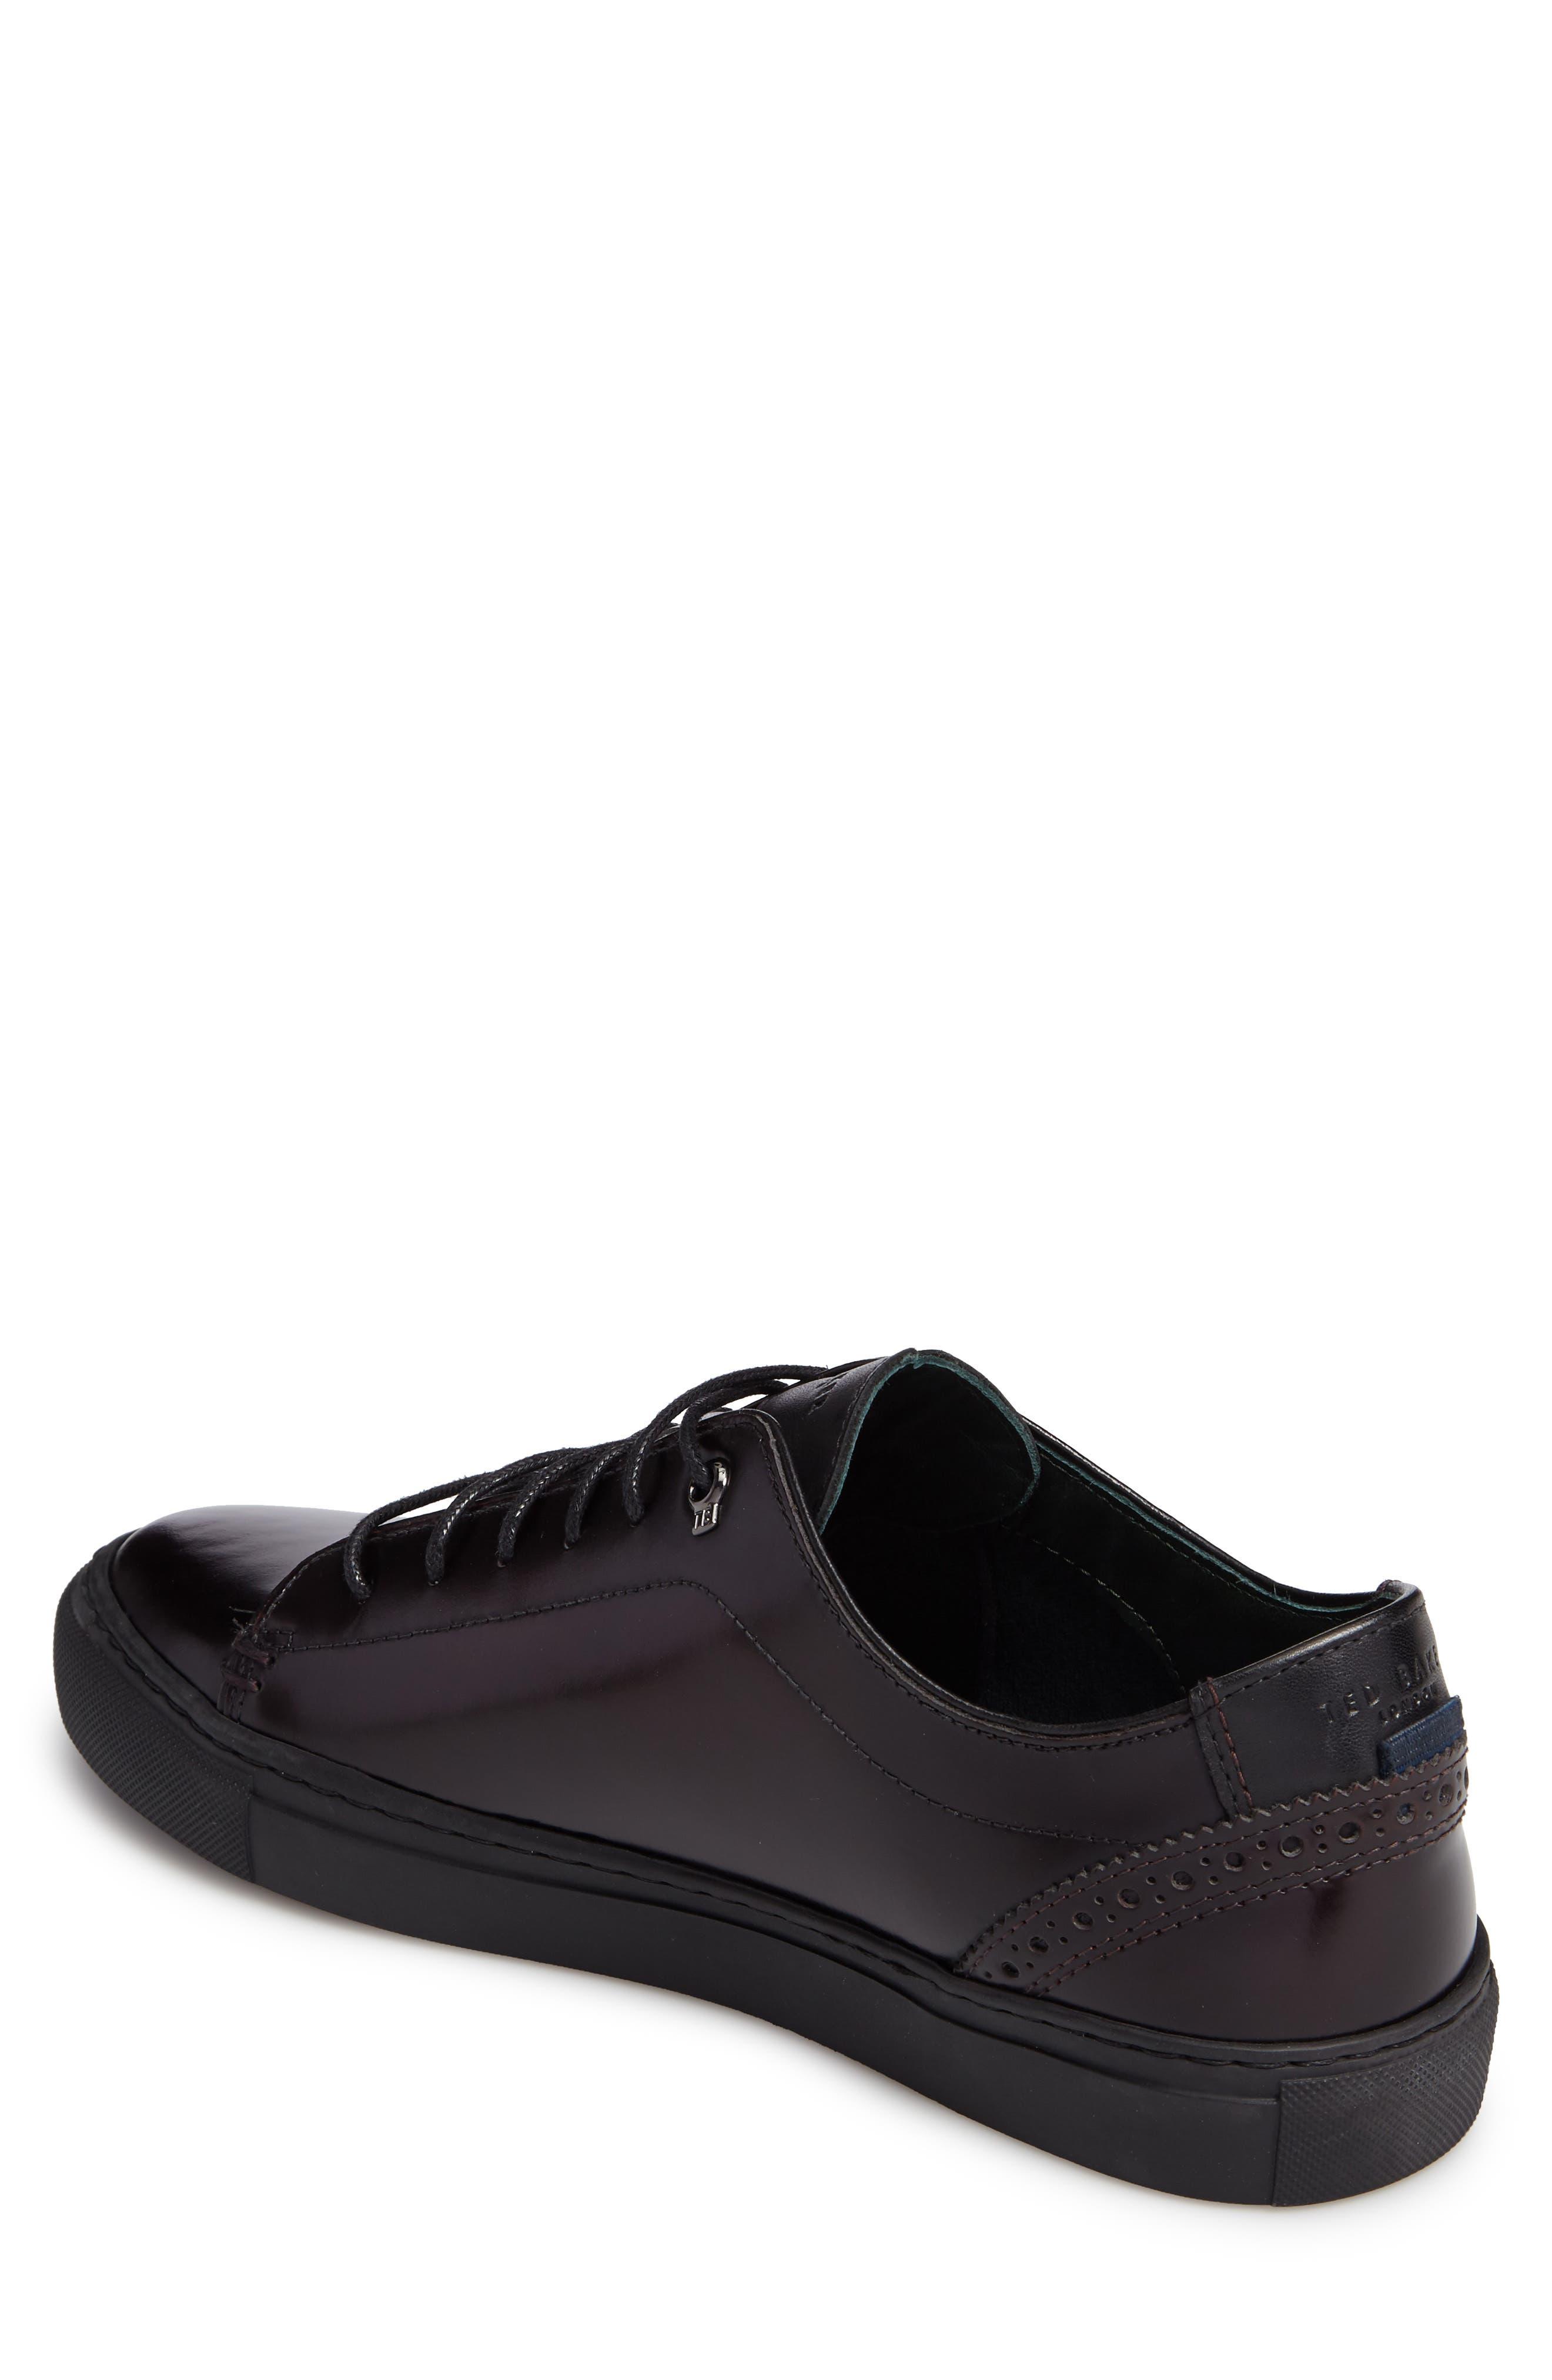 'Kiing Classic' Sneaker,                             Alternate thumbnail 36, color,